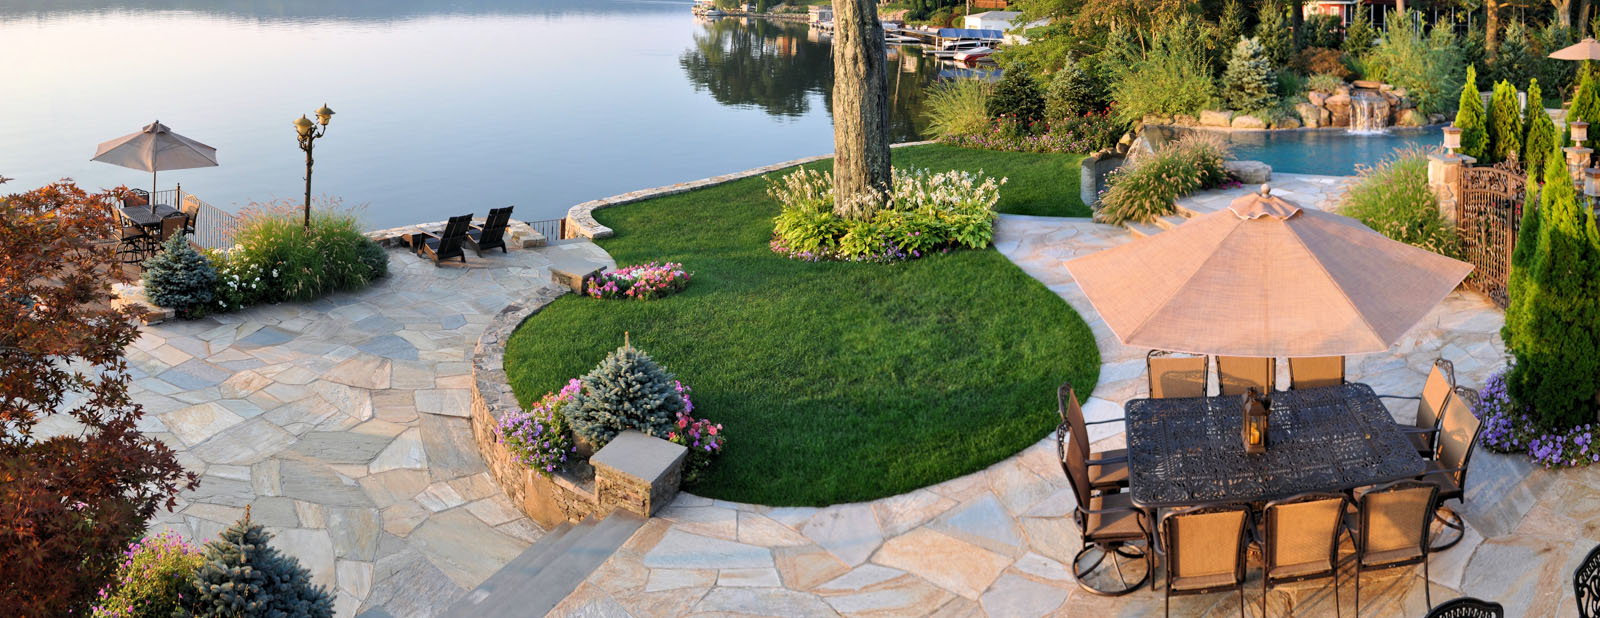 lakeside patio, plantings, pool - nj